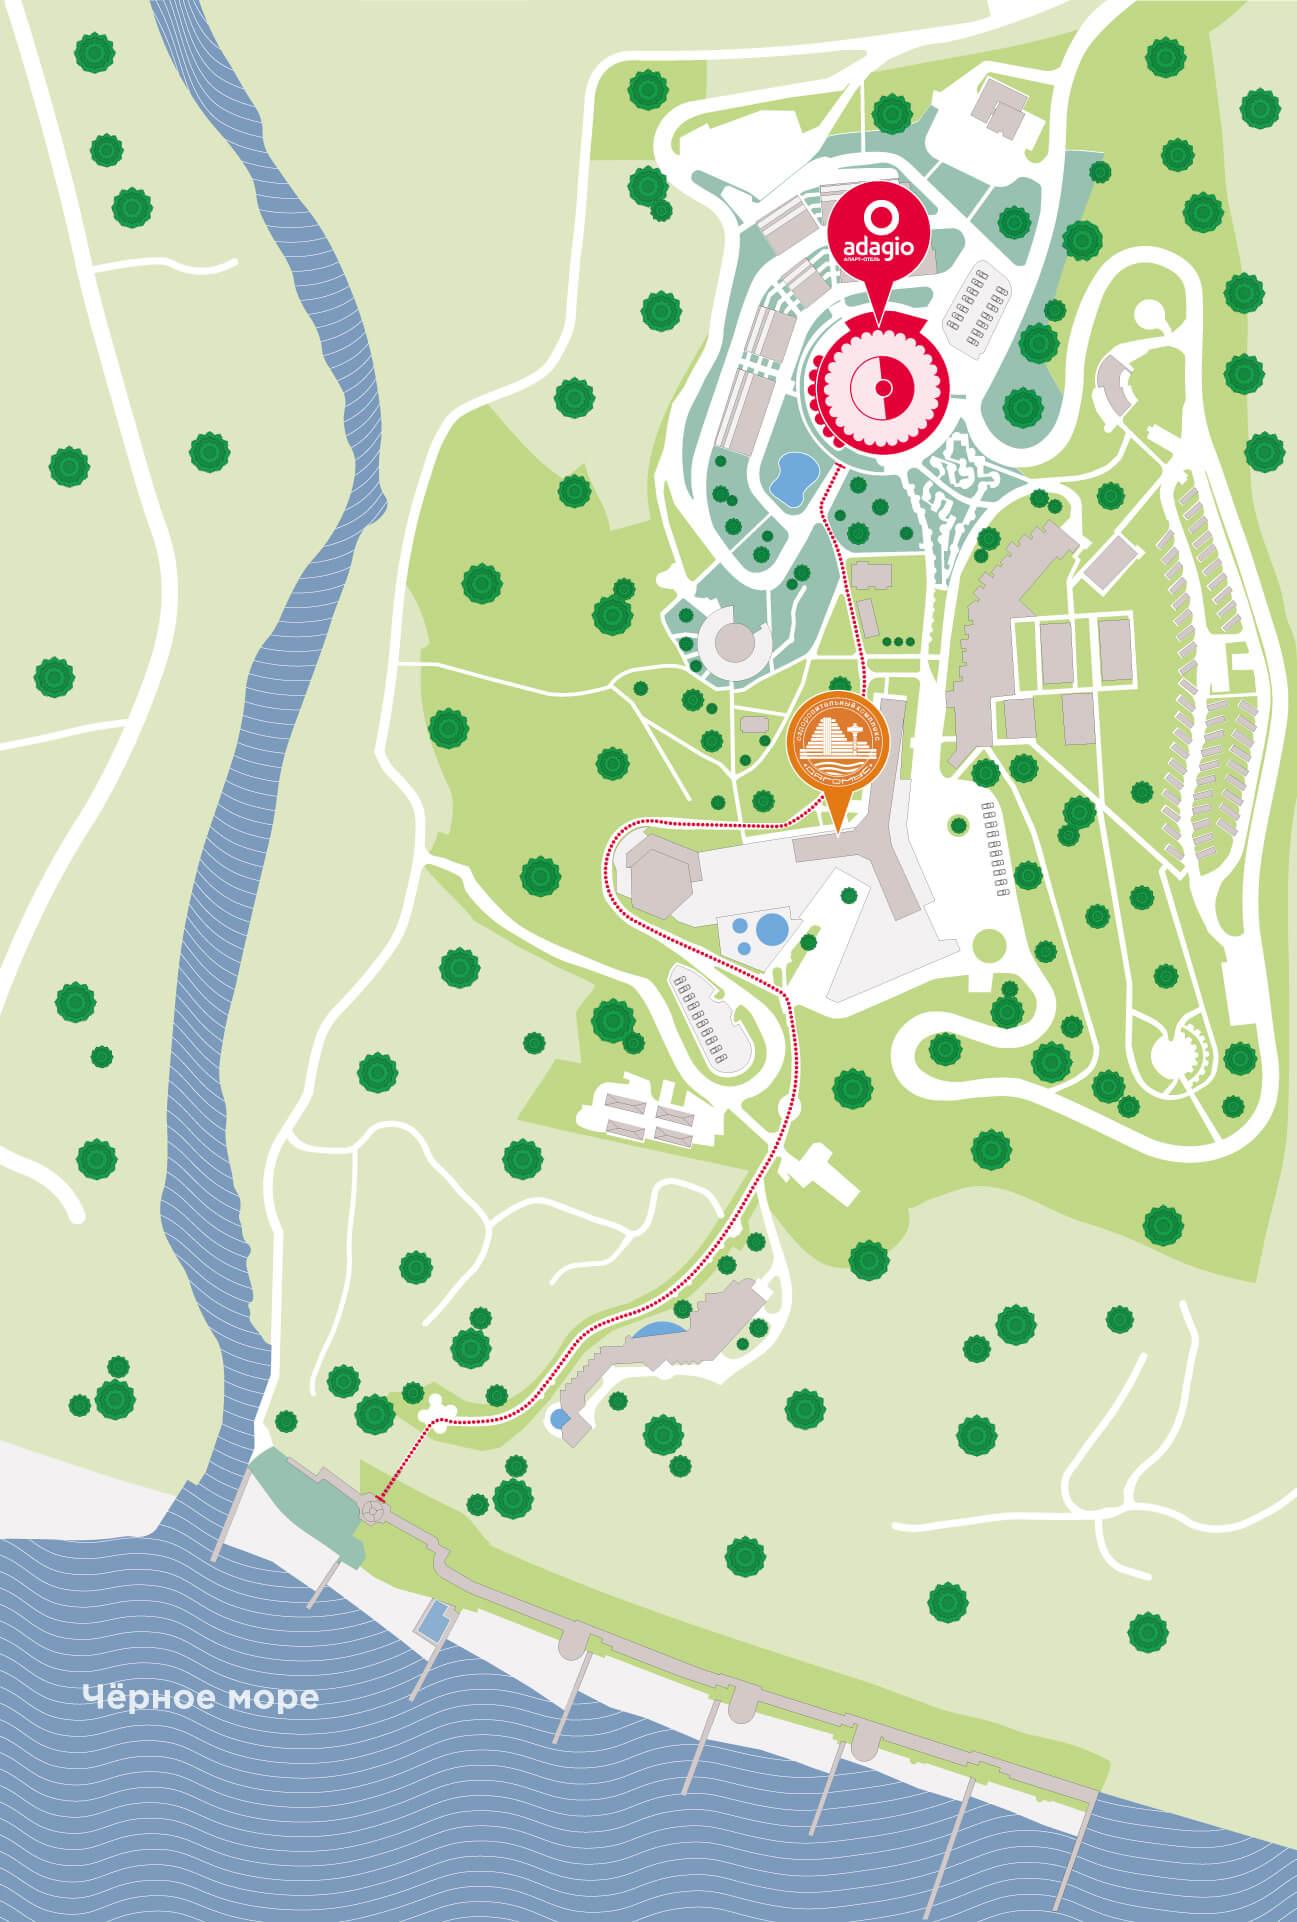 План территории Adagio Le Rond Sochi